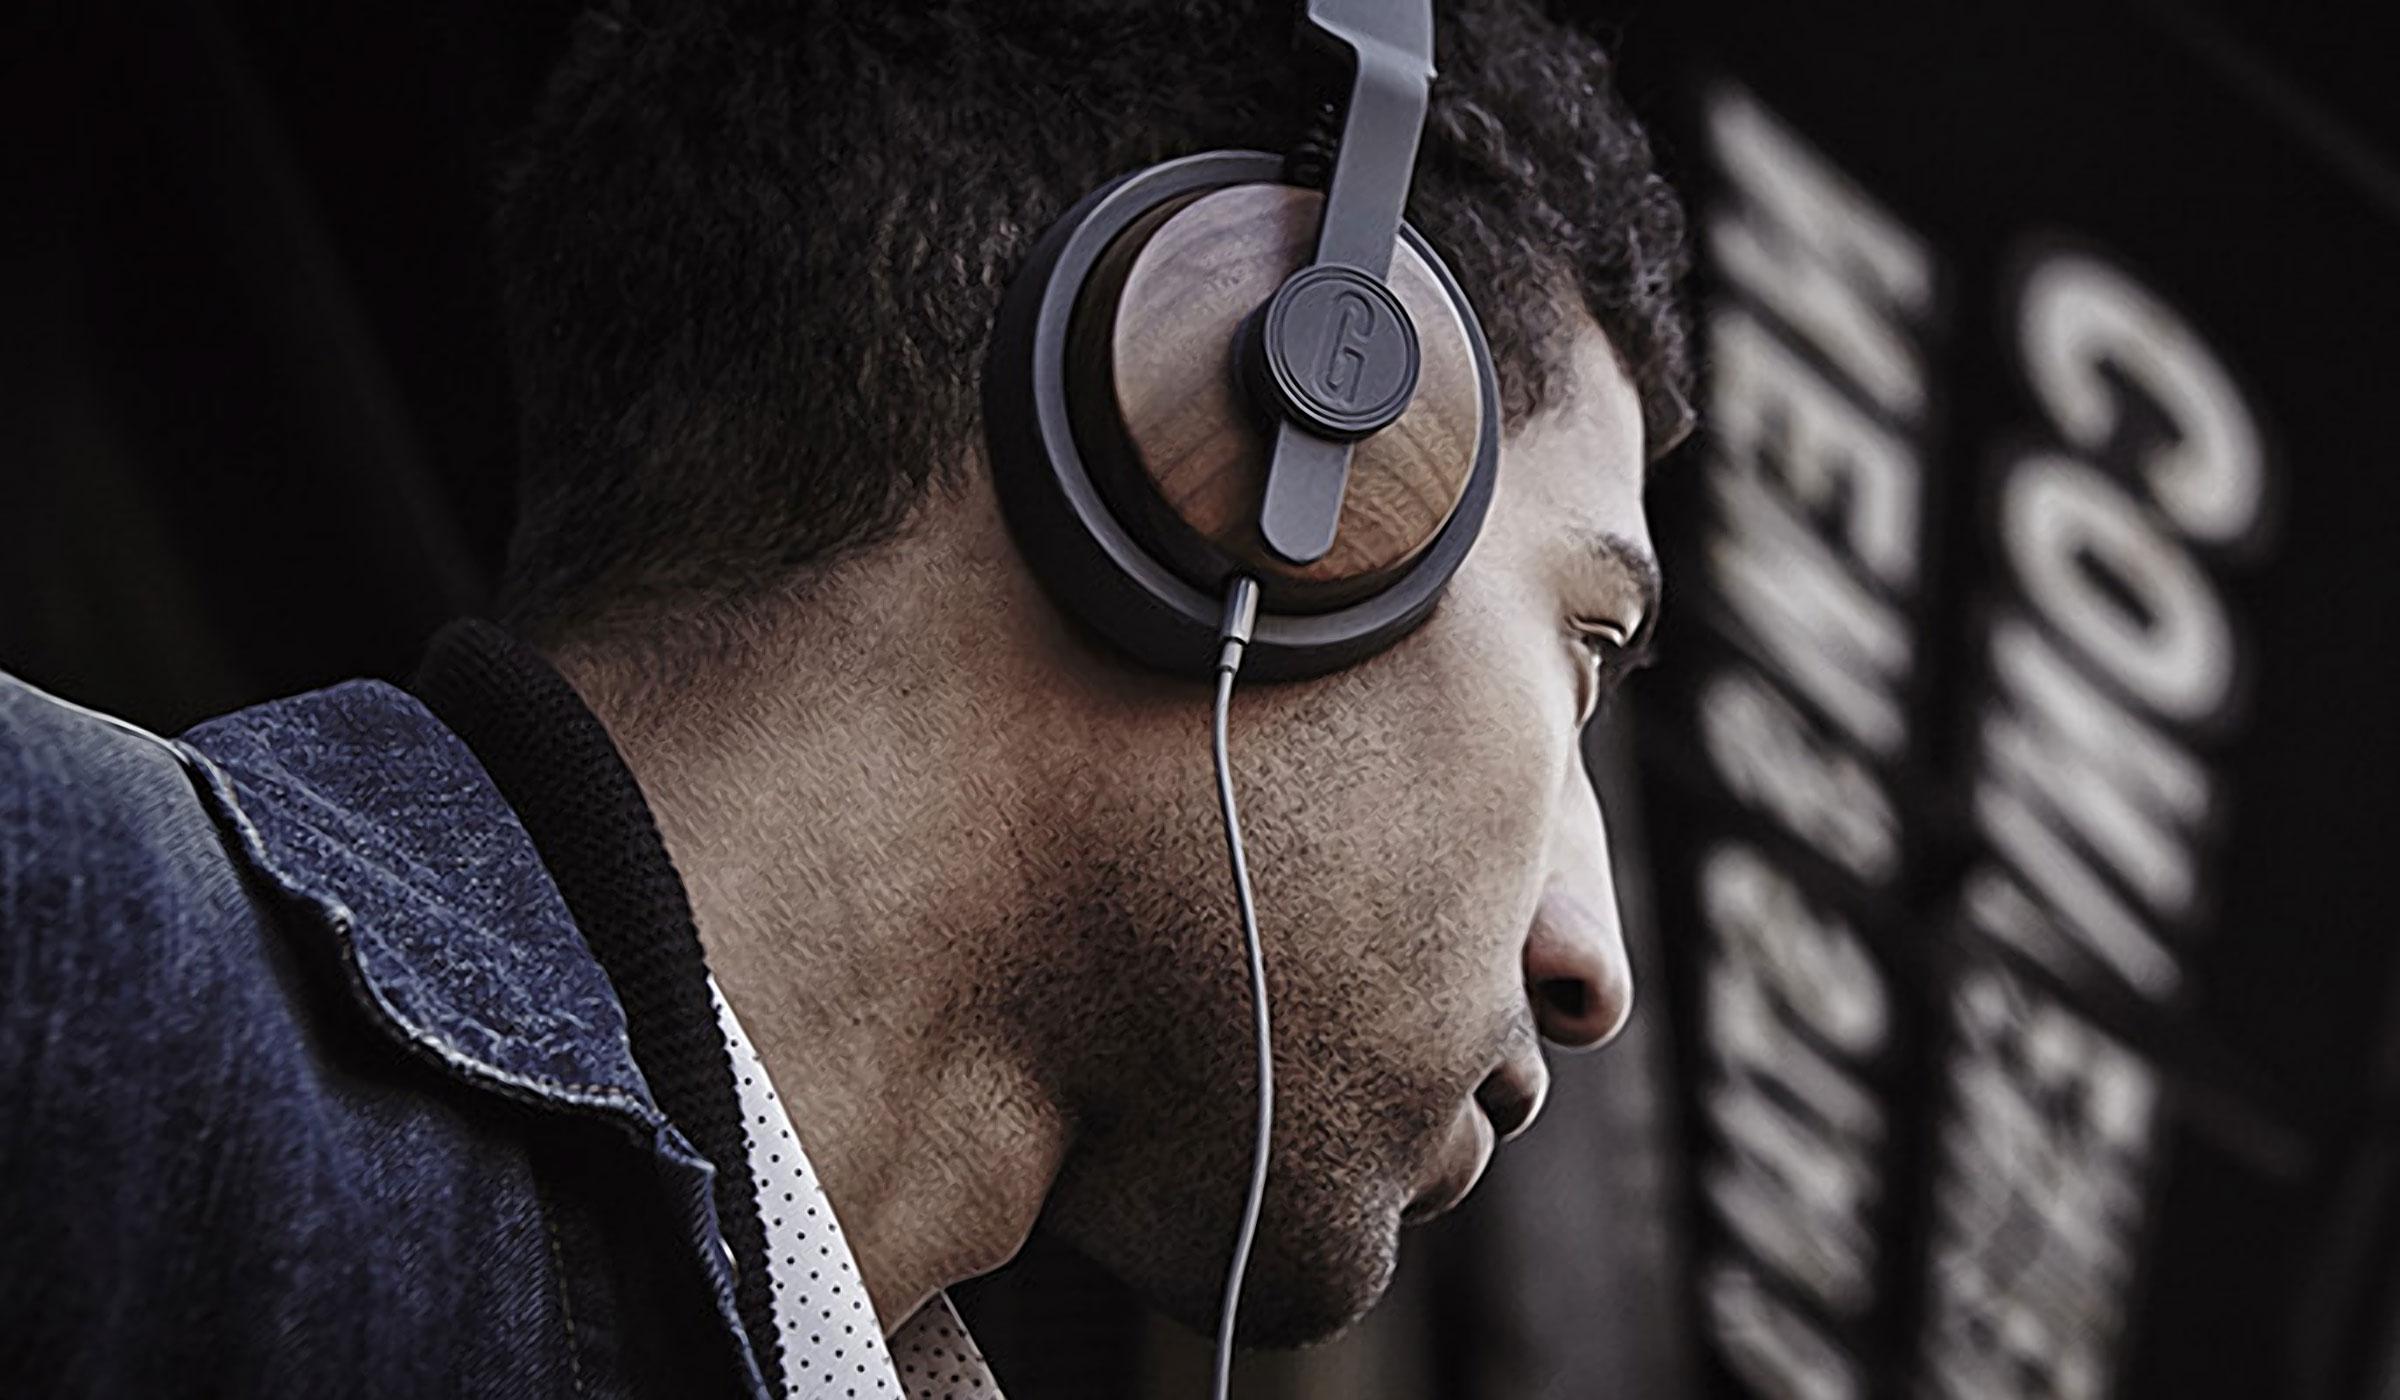 GRAIN AUDIO OEHP.01 SOLID WOOD HEADPHONES